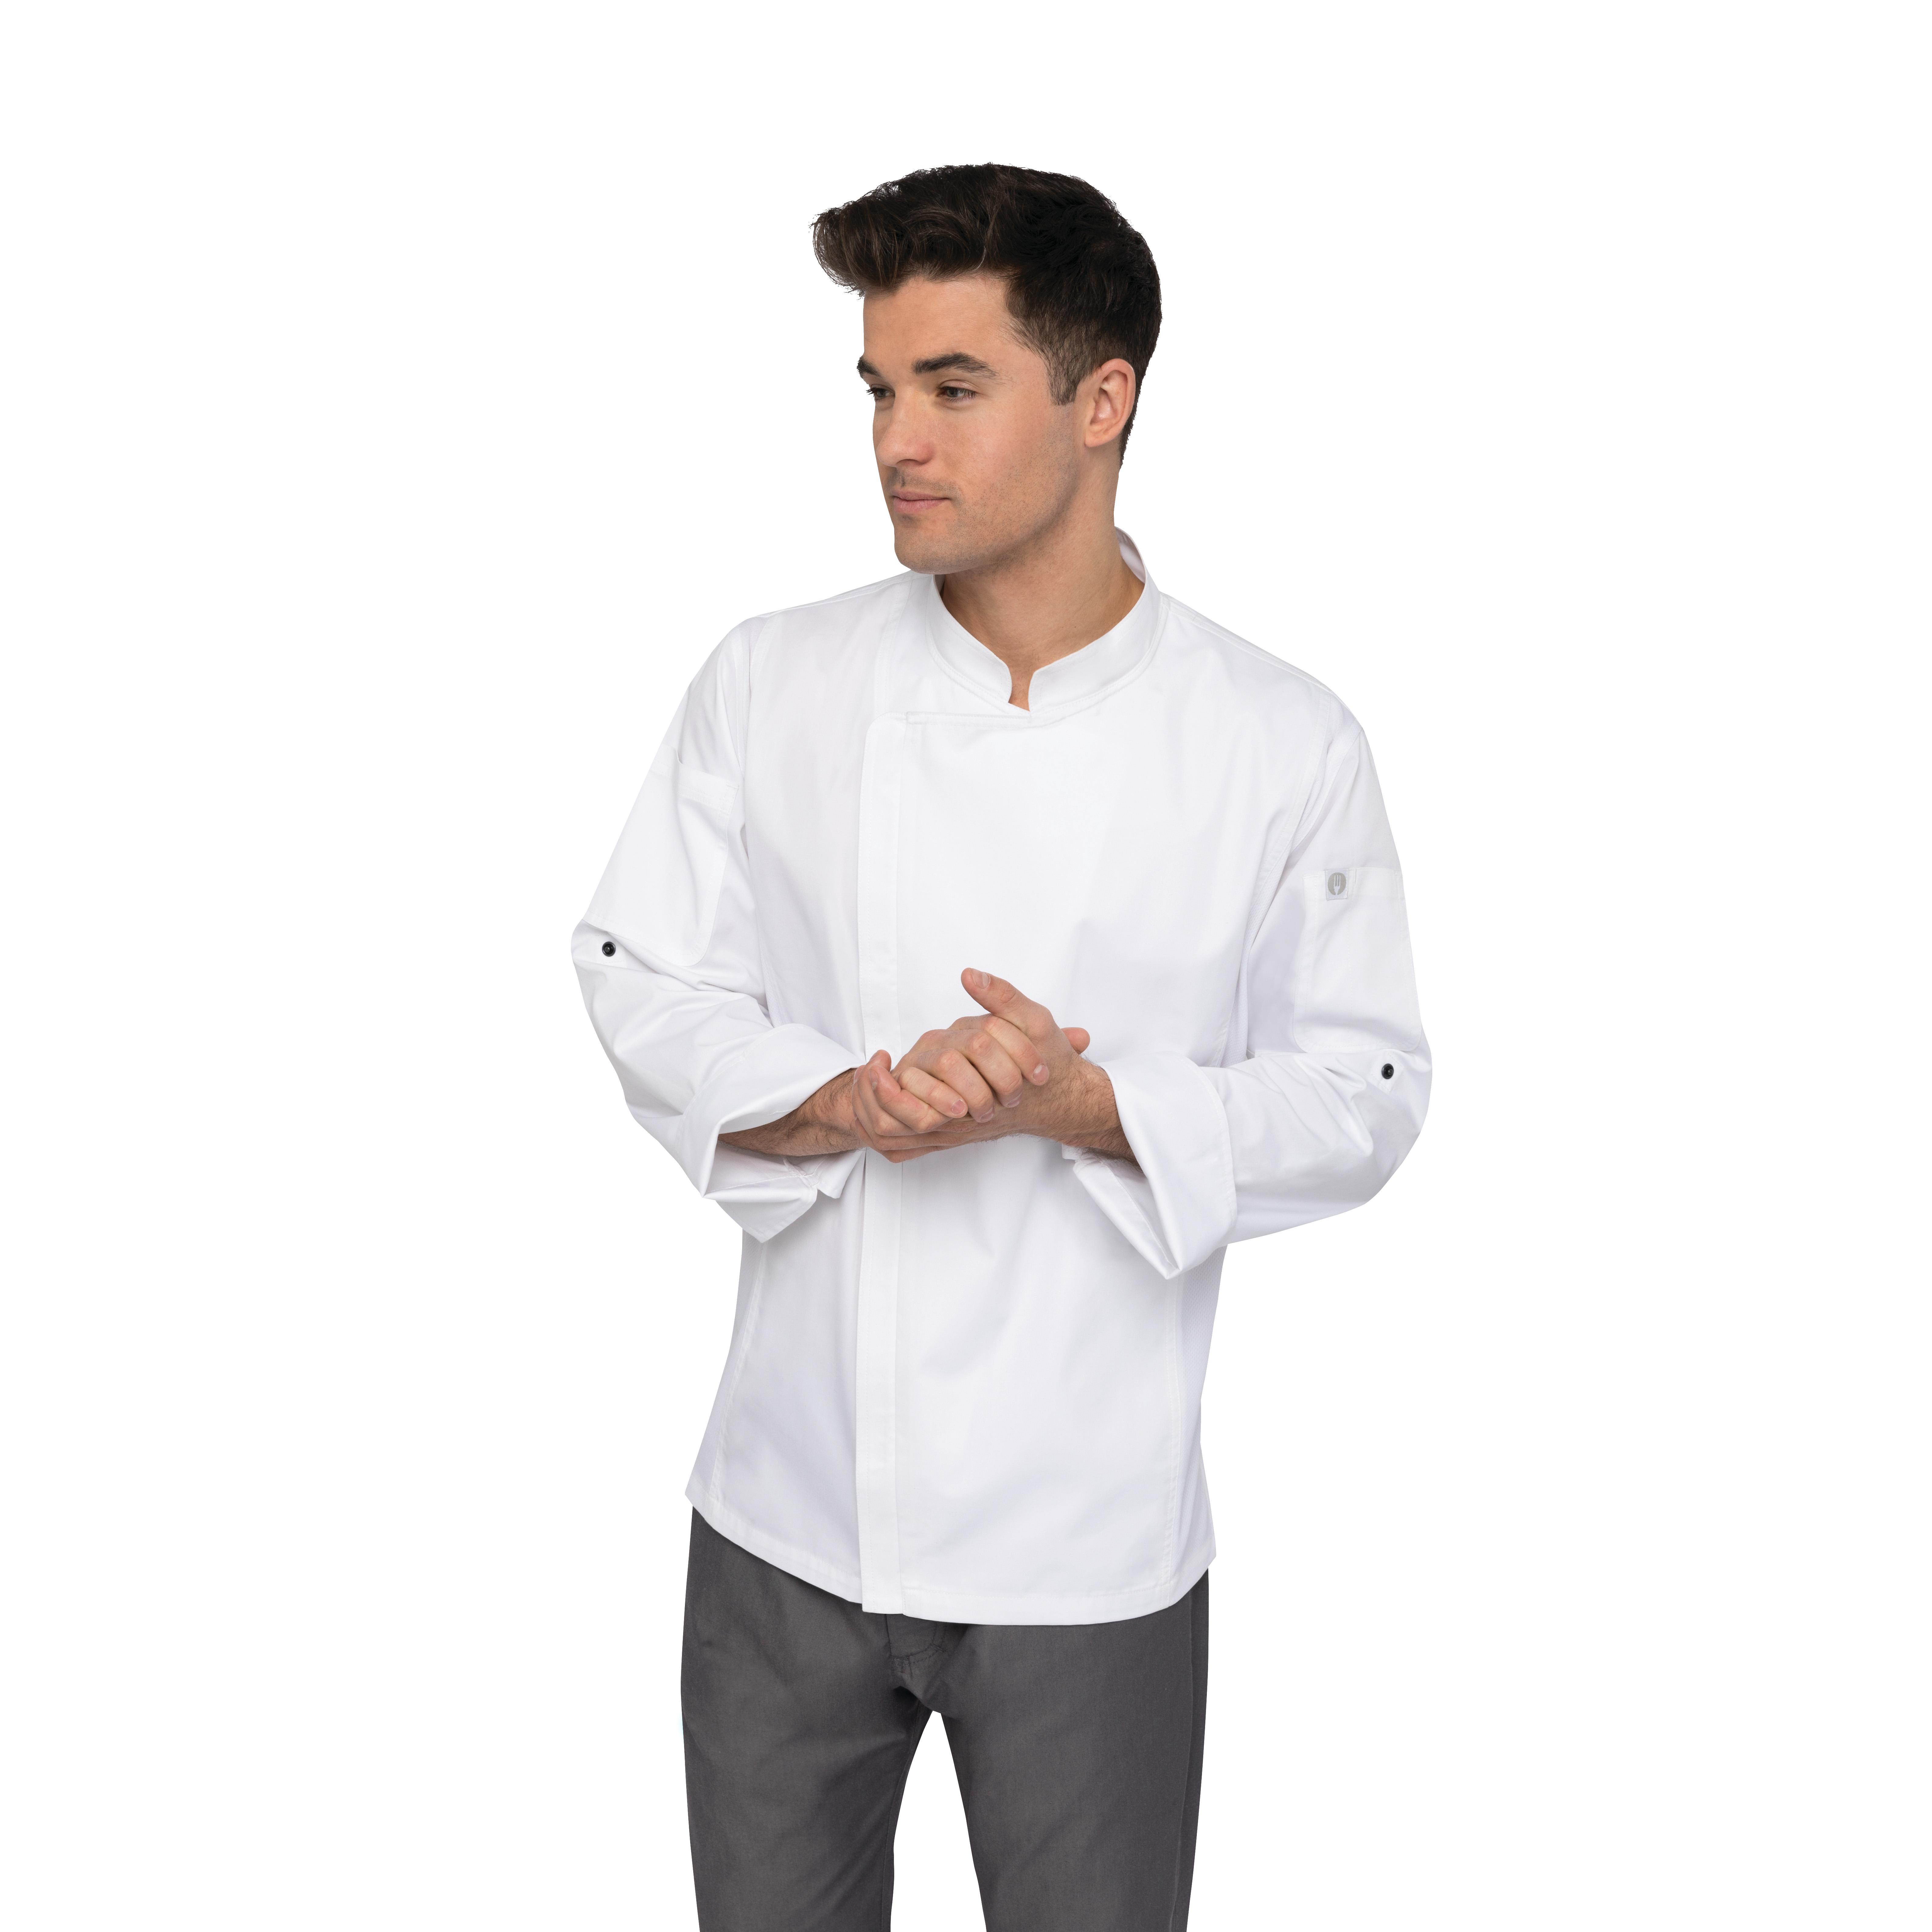 Chef Works BCLZ008WHT5XL chef's coat